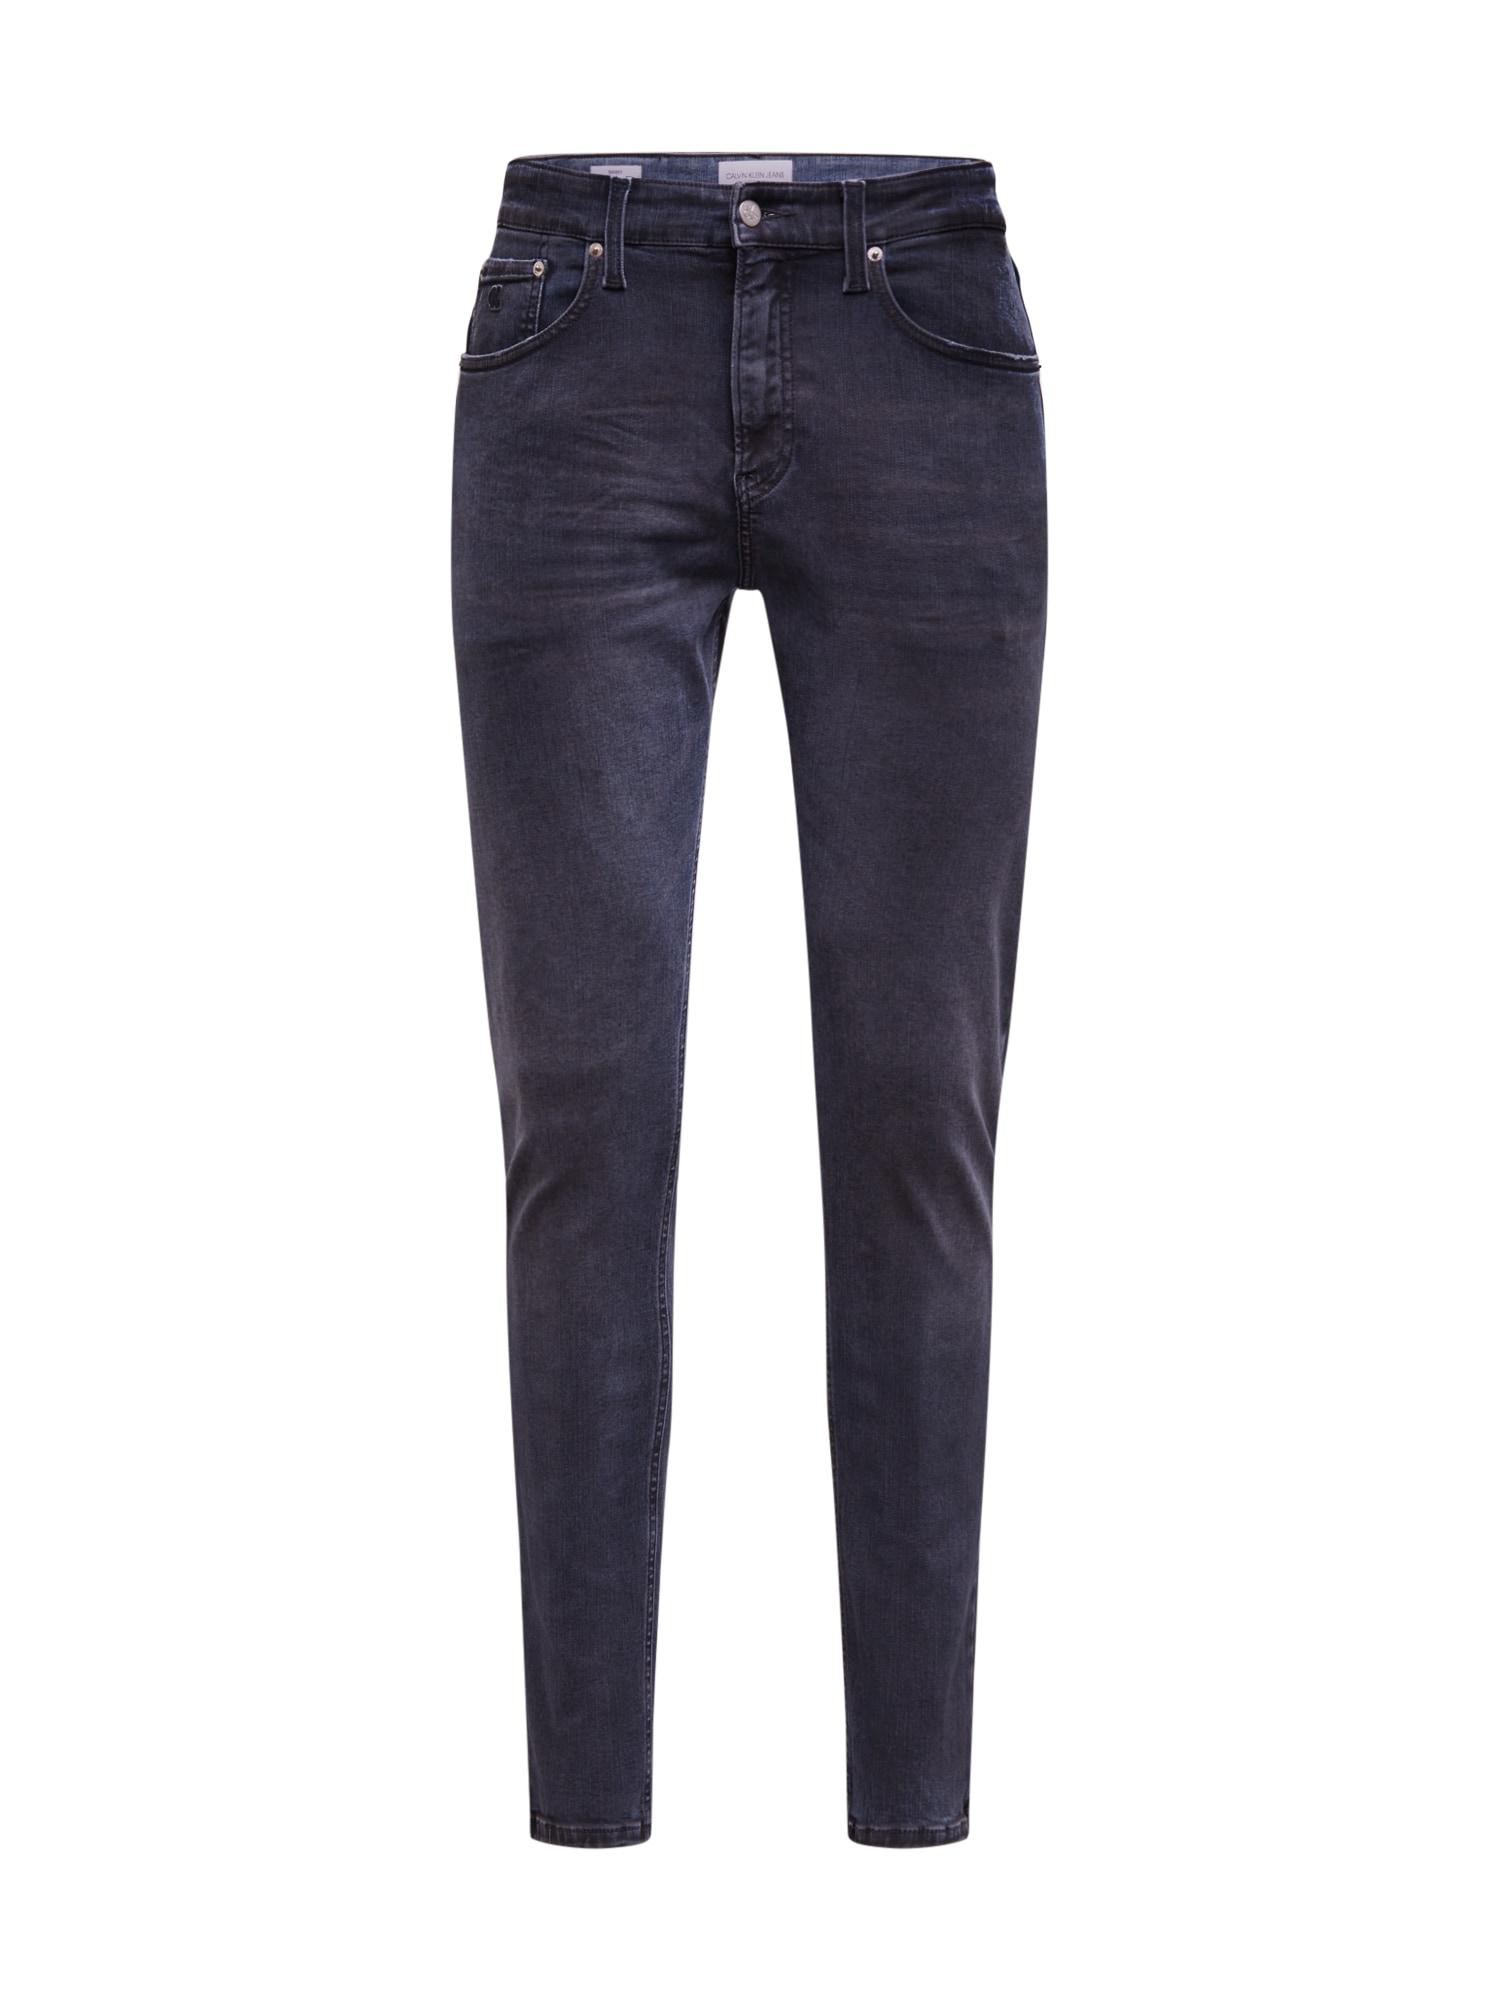 Calvin Klein Jeans Džinsai '016 SKINNY' pilko džinso